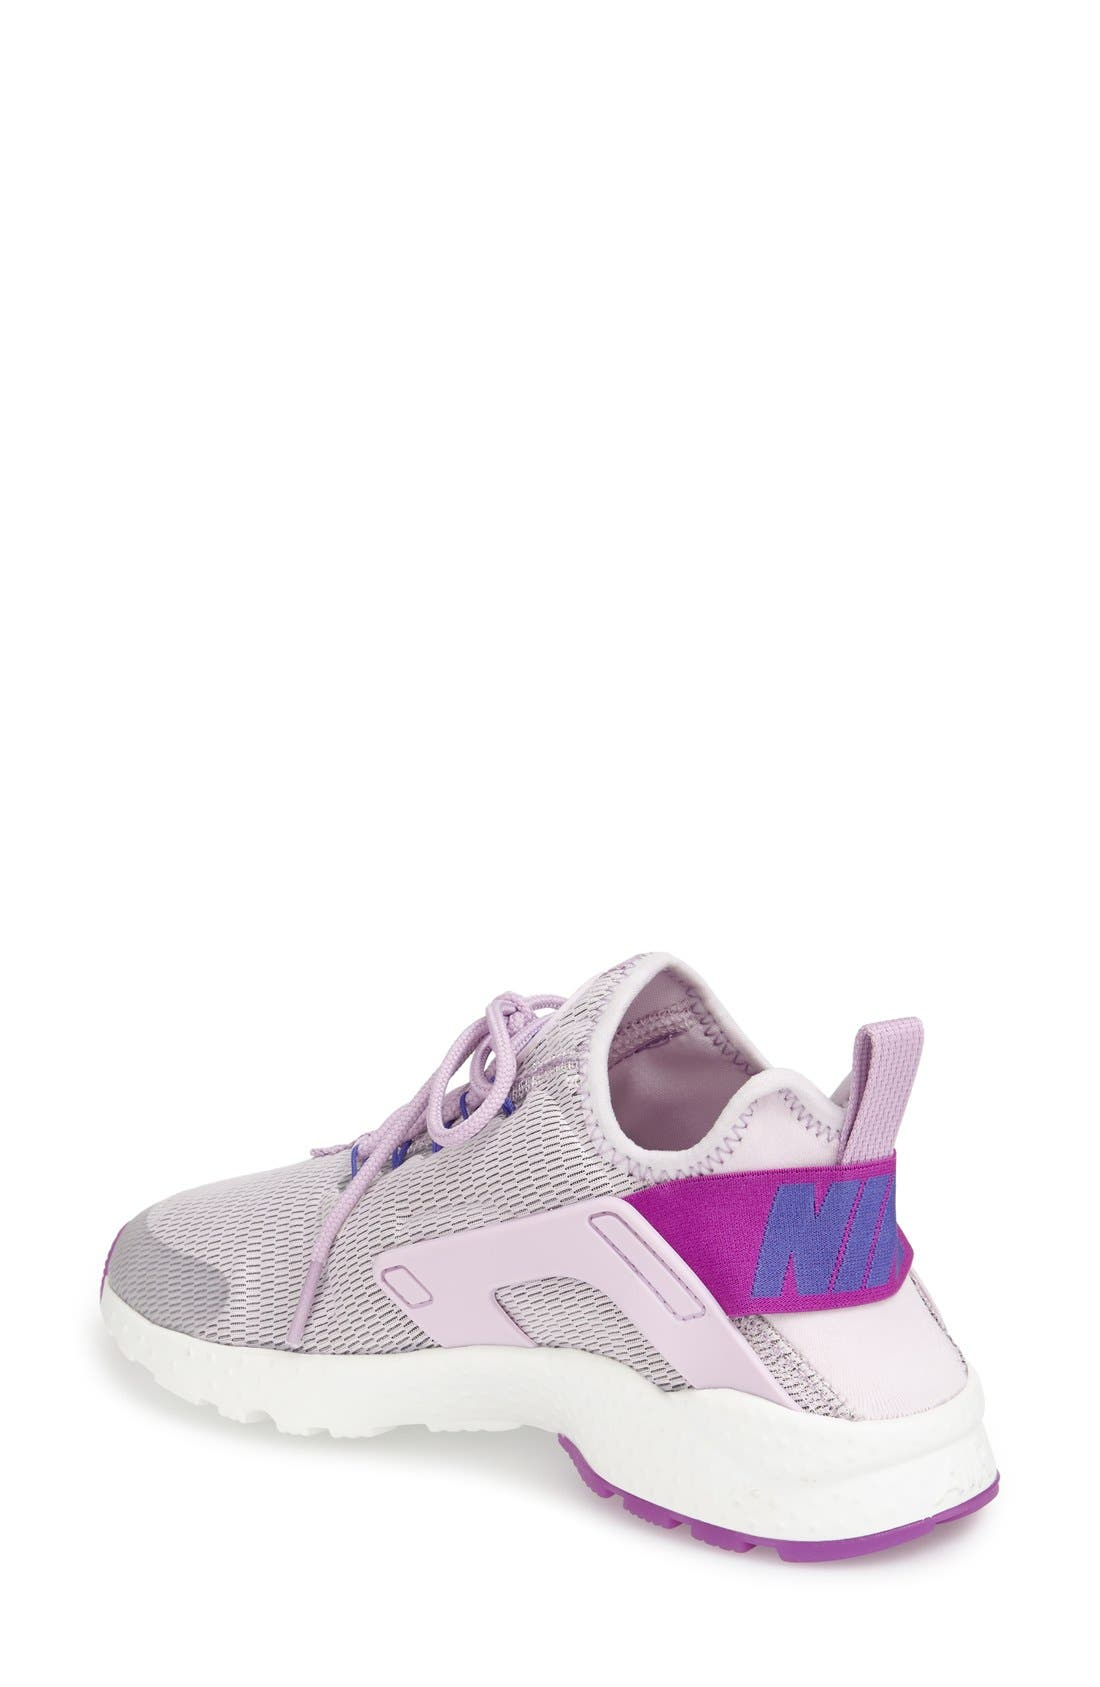 Air Huarache Sneaker,                             Alternate thumbnail 73, color,